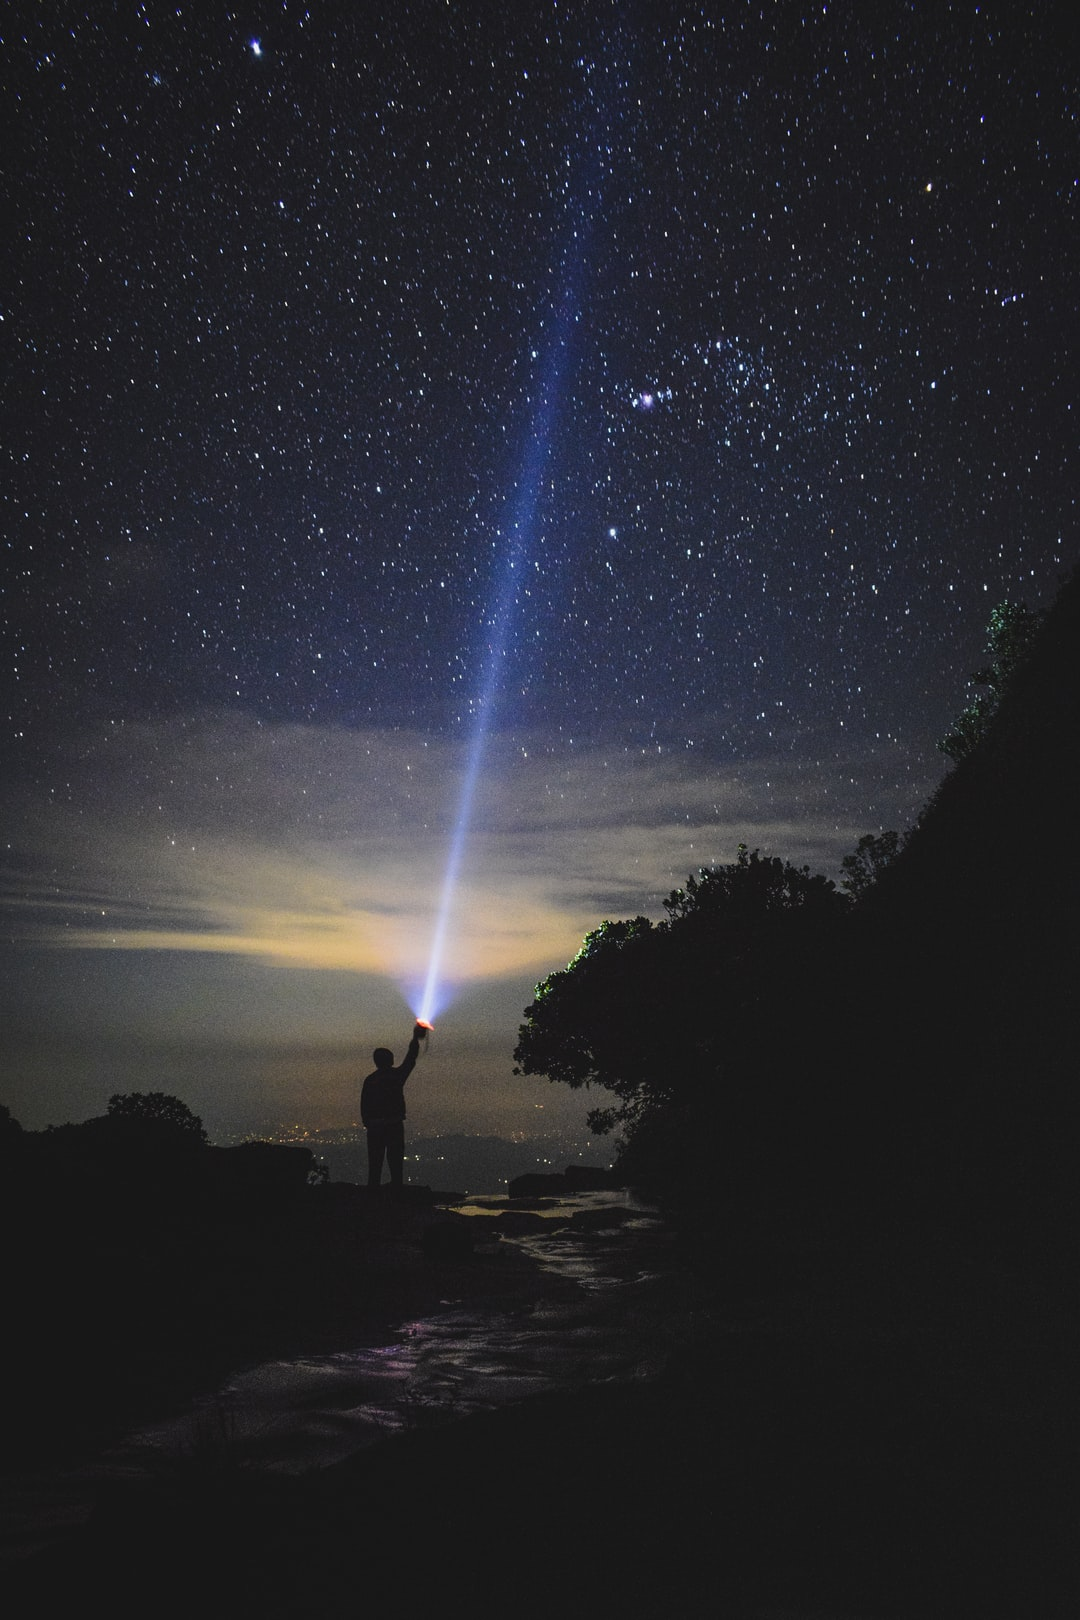 Lightup the sky